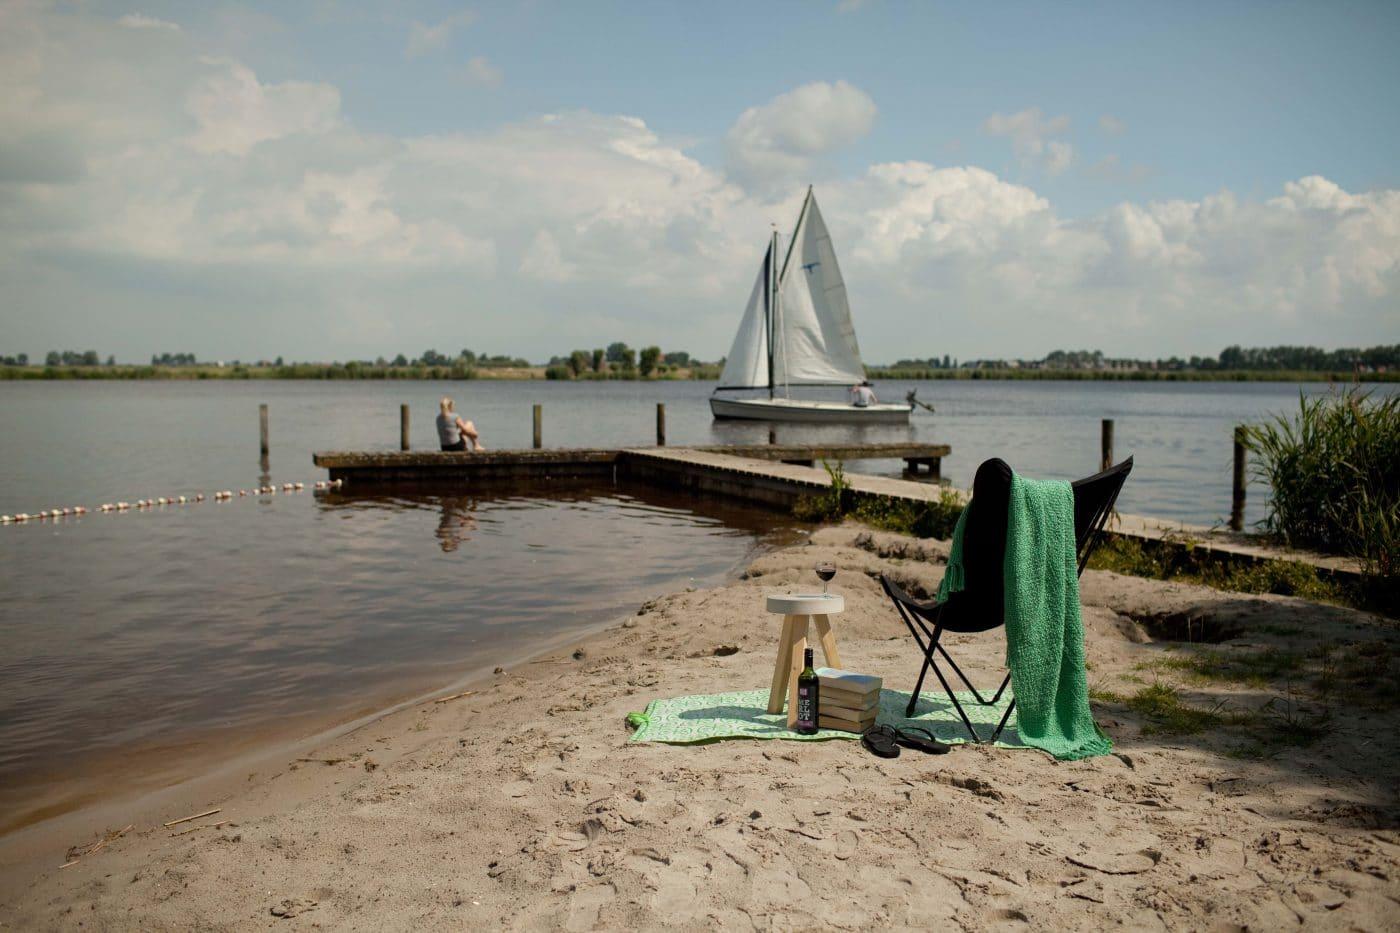 Offerta Vela A: 6 Persone Chalet+ Barca A Vela Polyvalk A Partire Da € 513 A Settimana